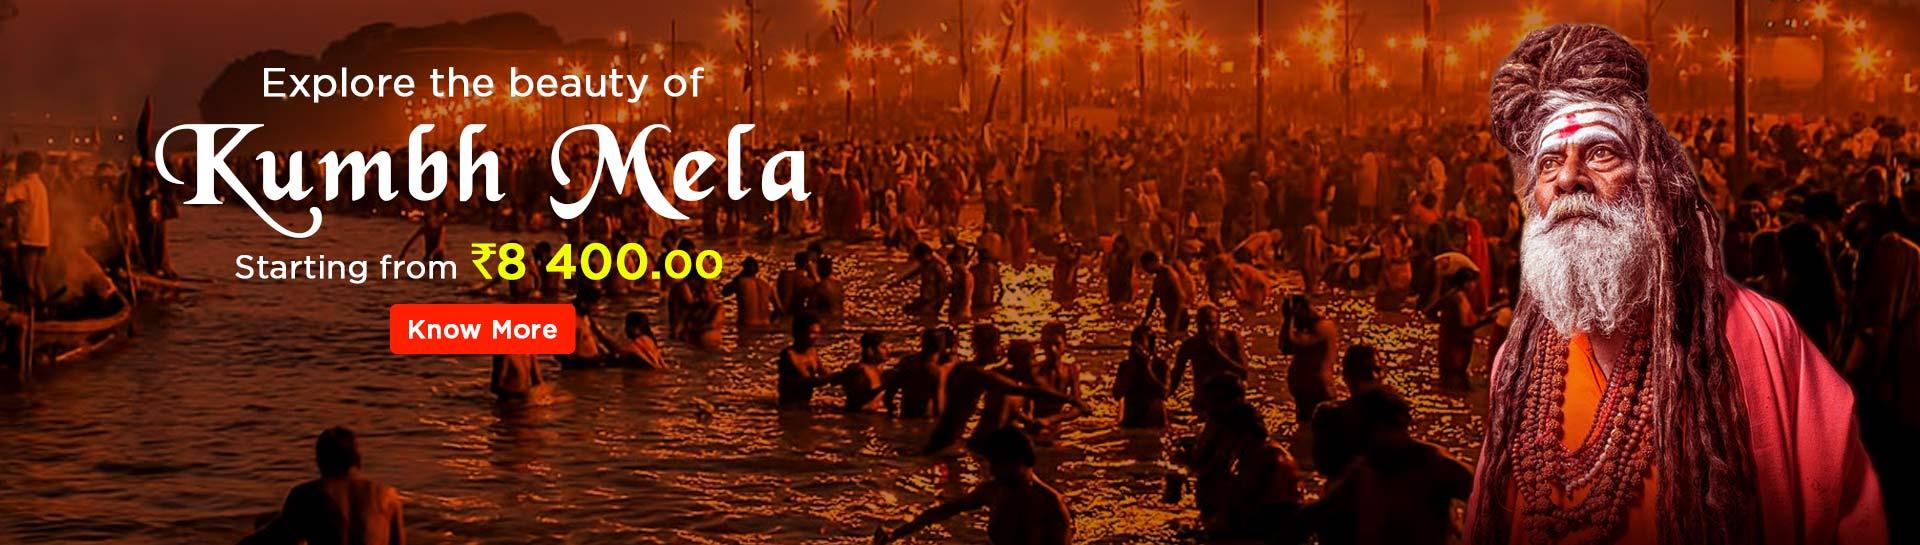 Explore The Beauty Of Kumbh Mela